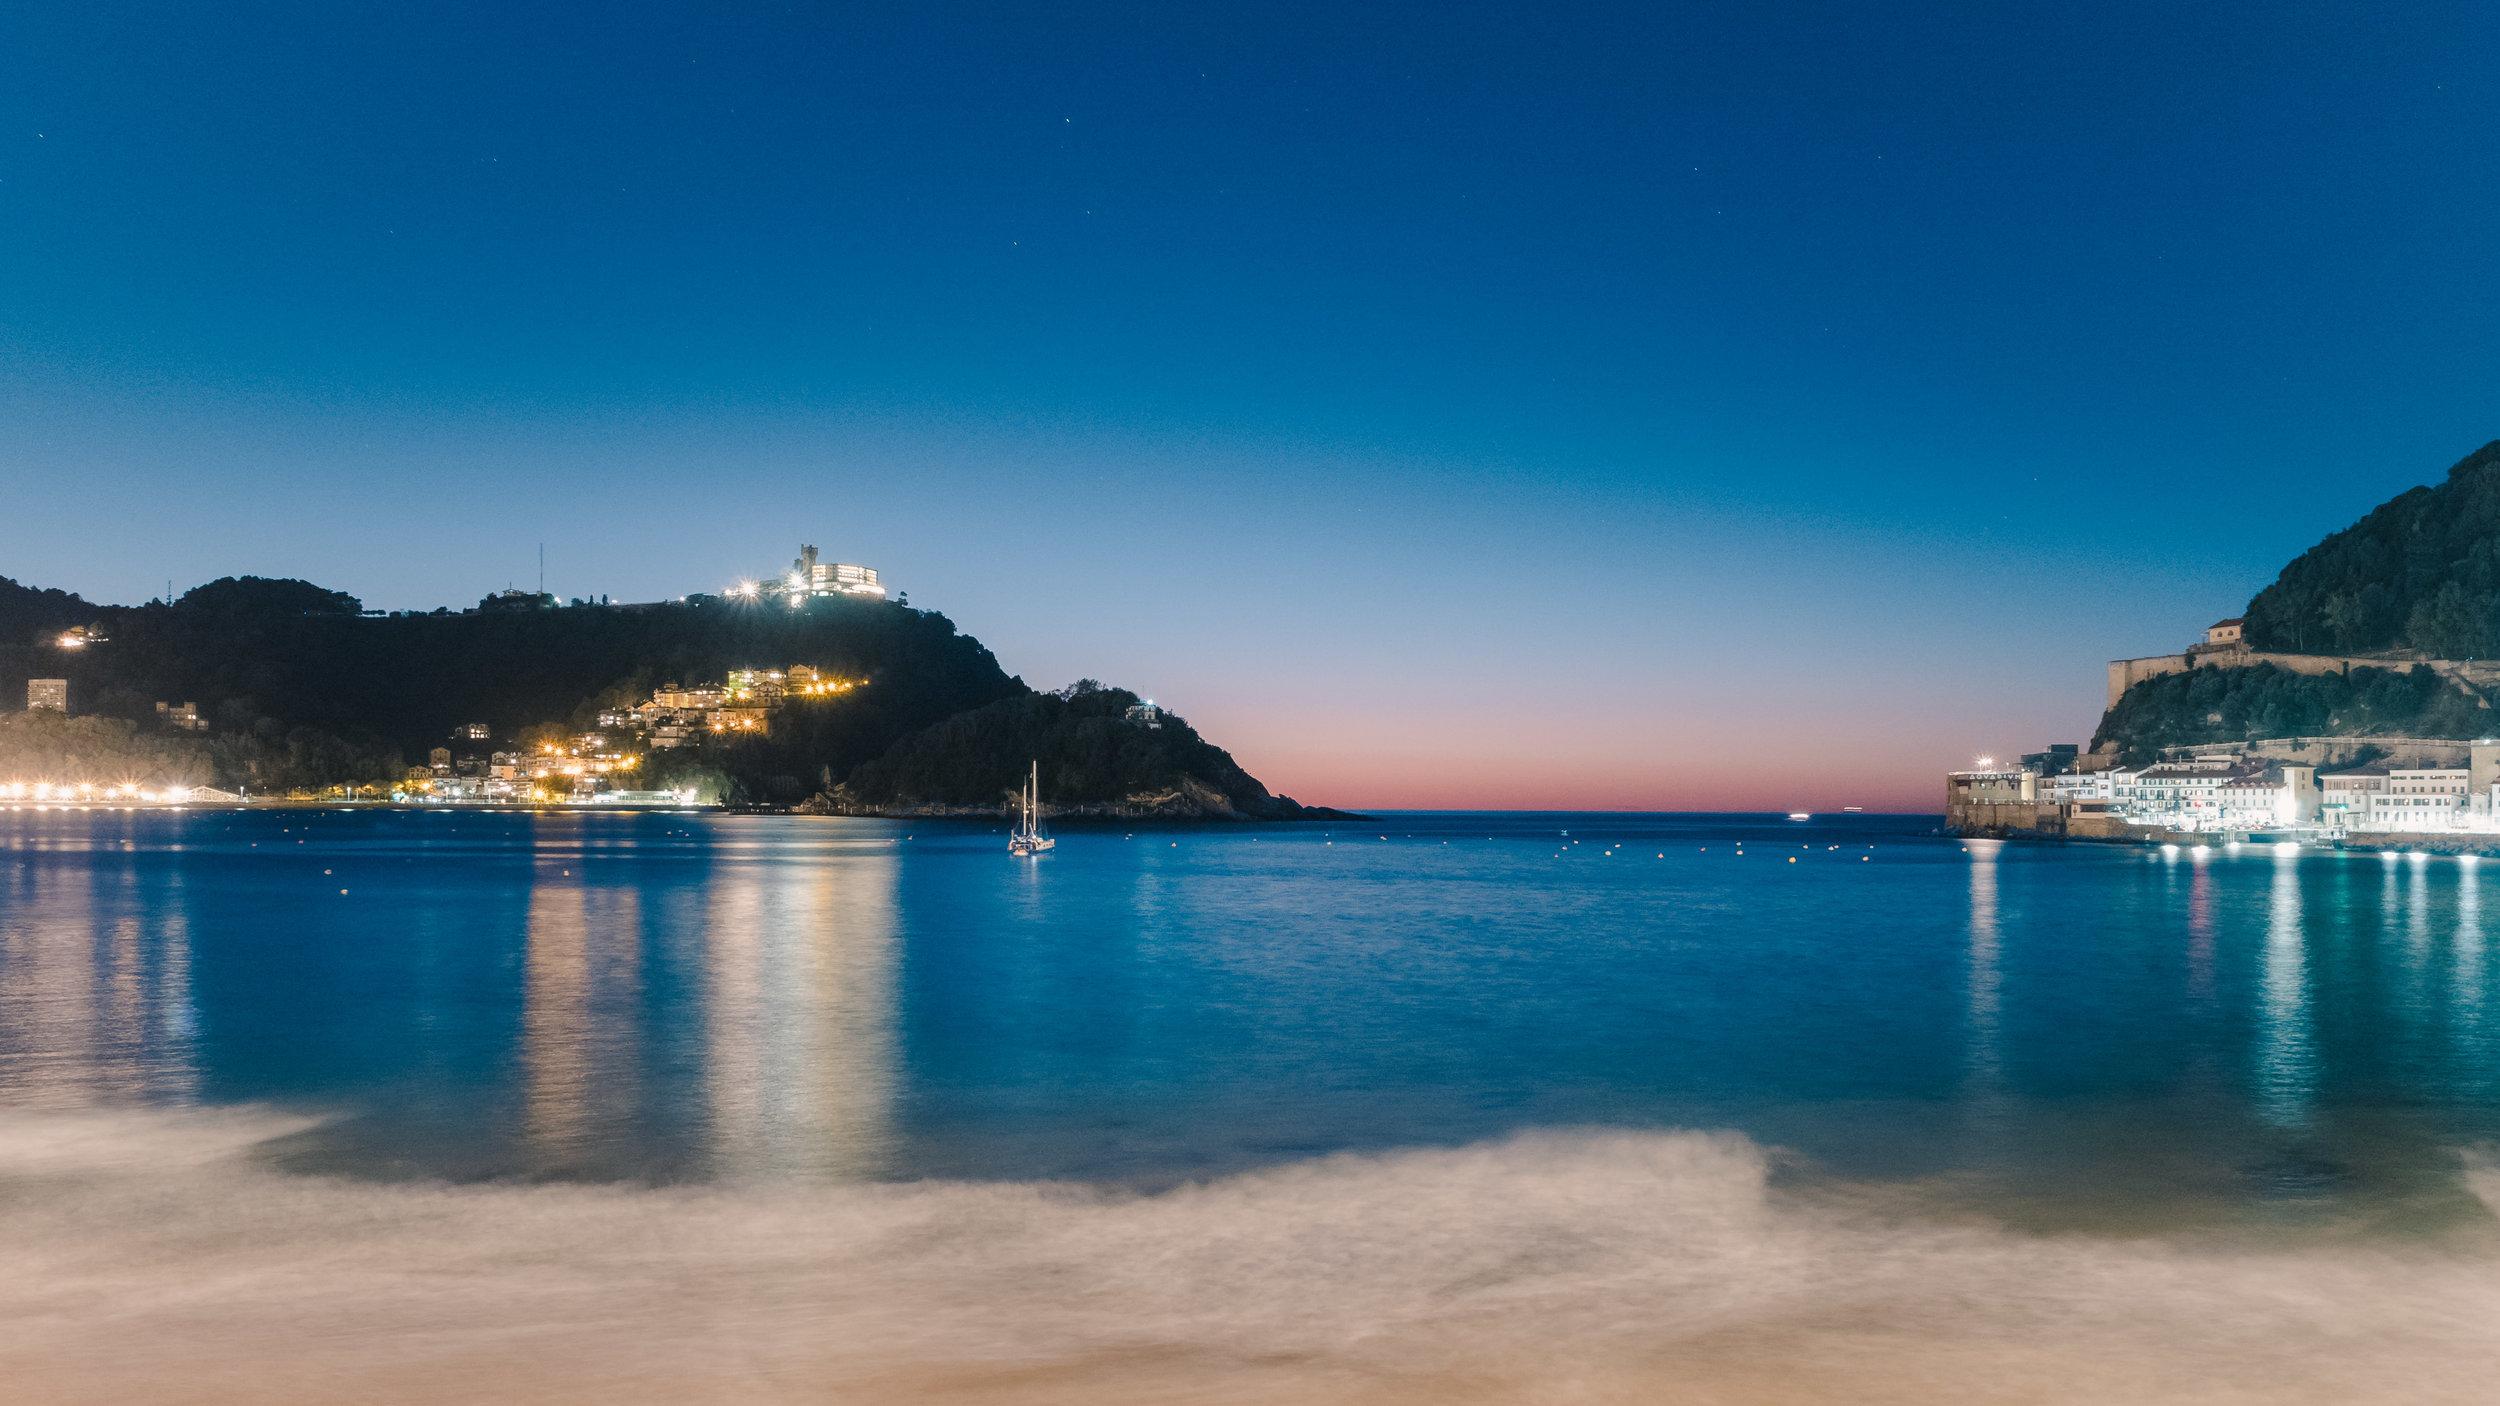 Night over the bay in San Sebastián.